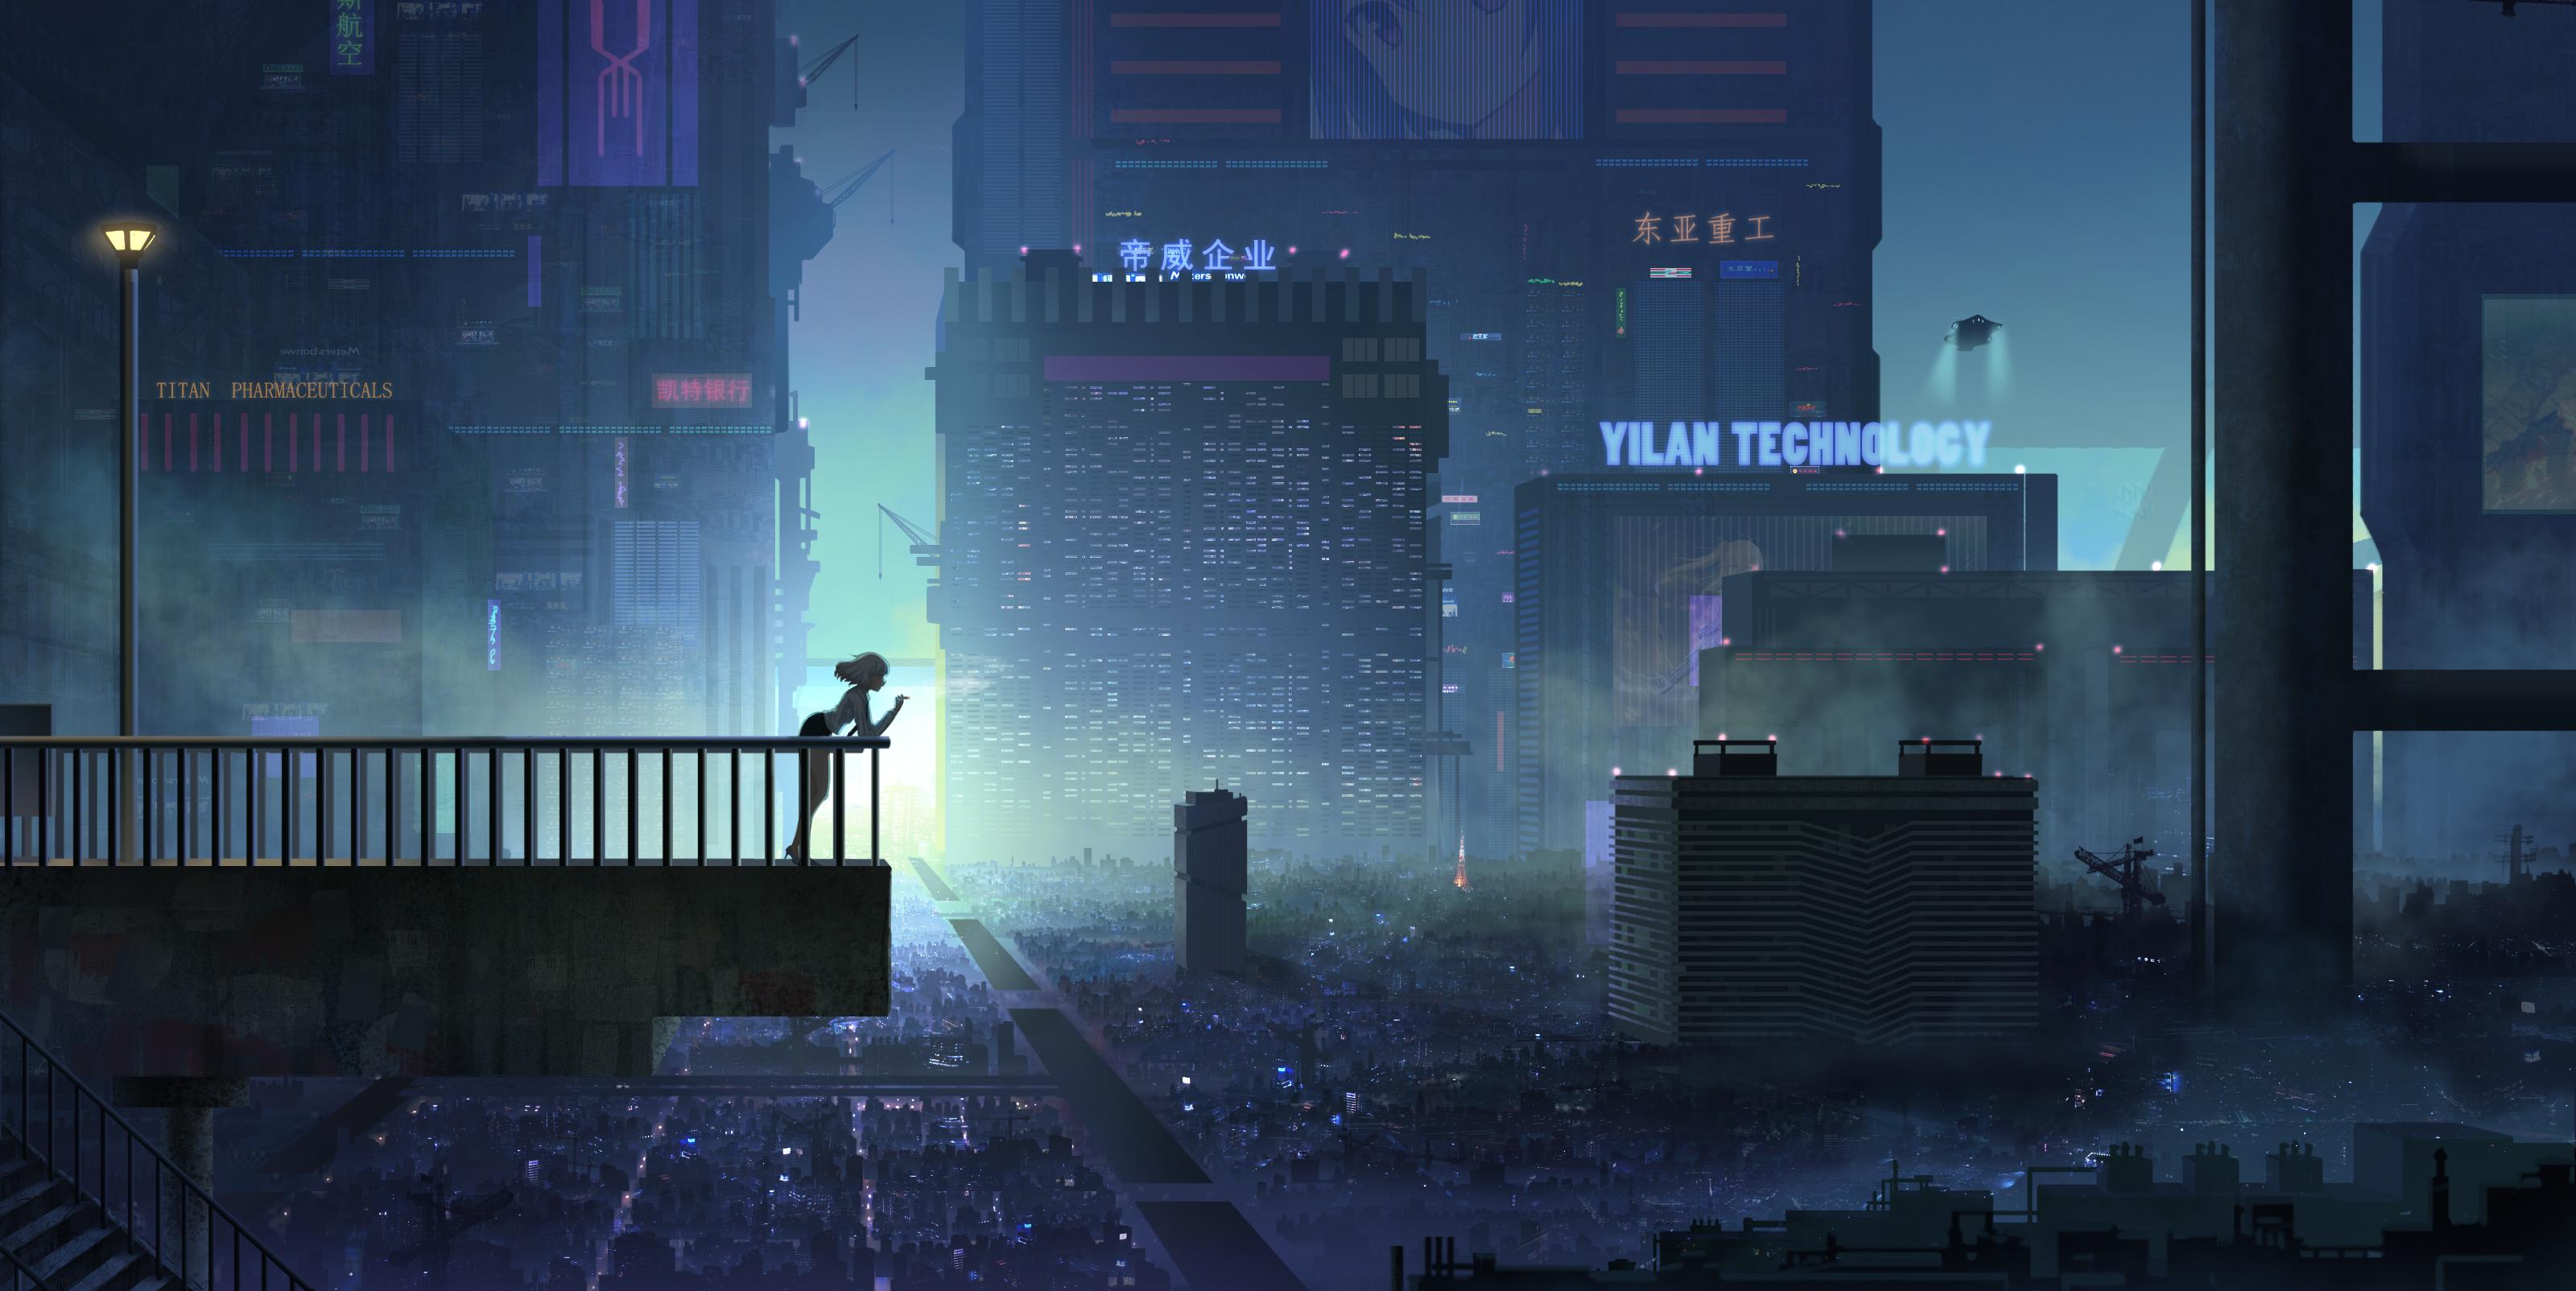 Anime 3200x1604 cyberpunk smoking city fence stairs city lights anime billboards futuristic futuristic city